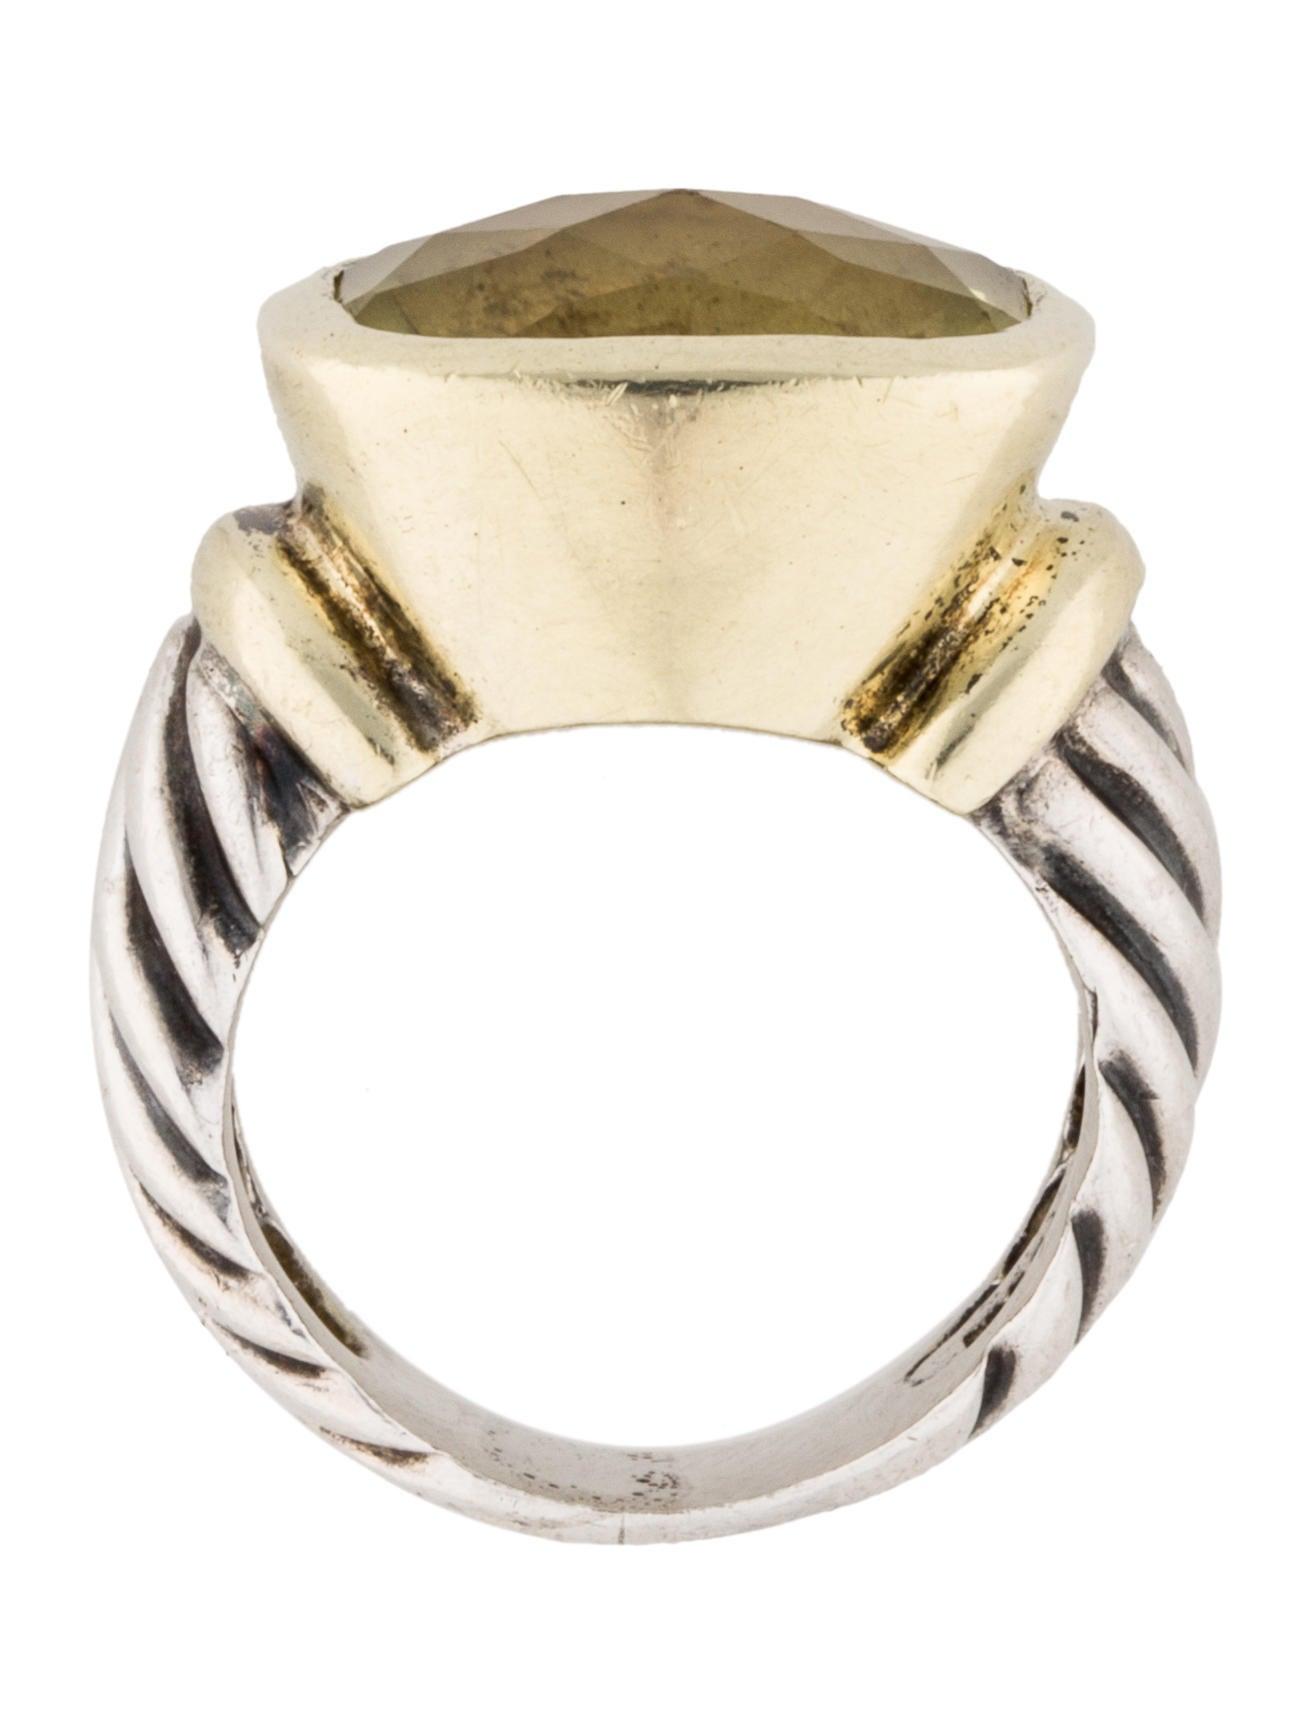 David yurman citrine noblesse ring rings dvy27666 for David yurman inspired jewelry rings